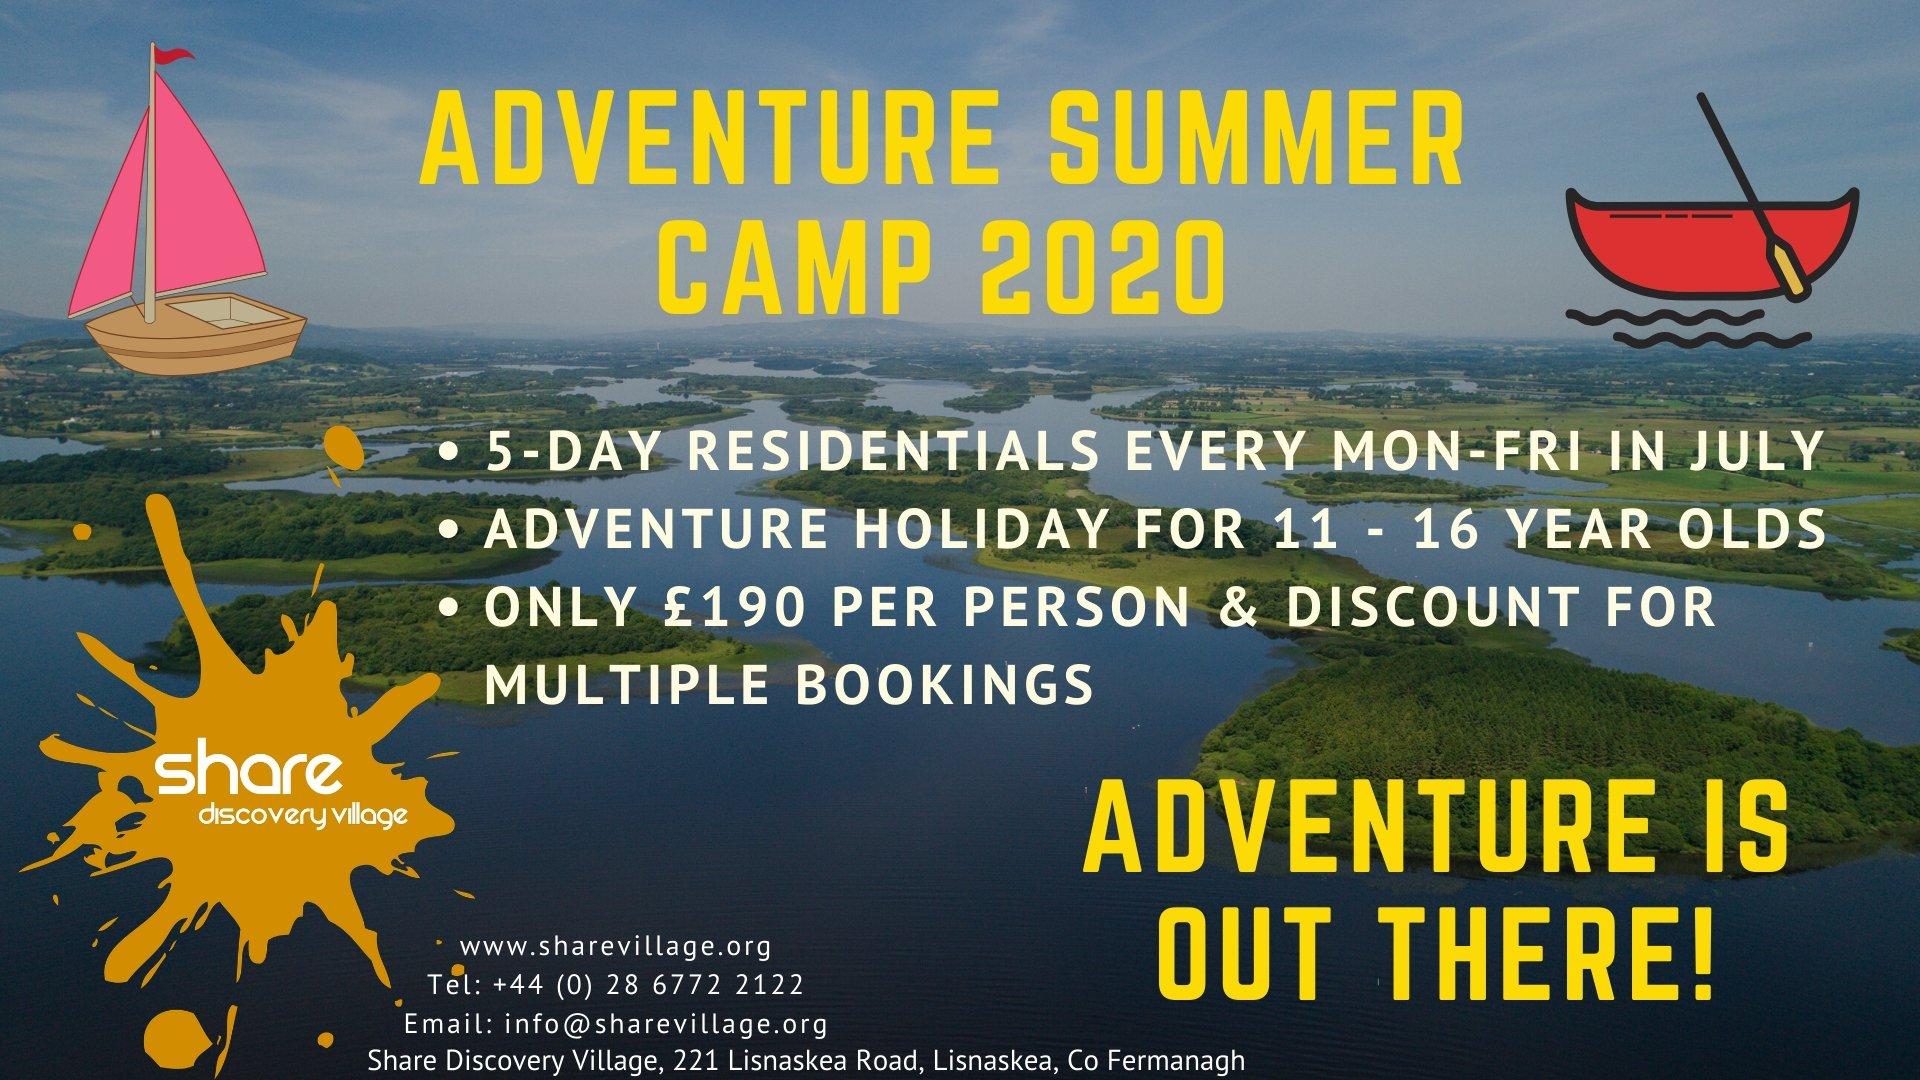 July Adventure Summer Camp